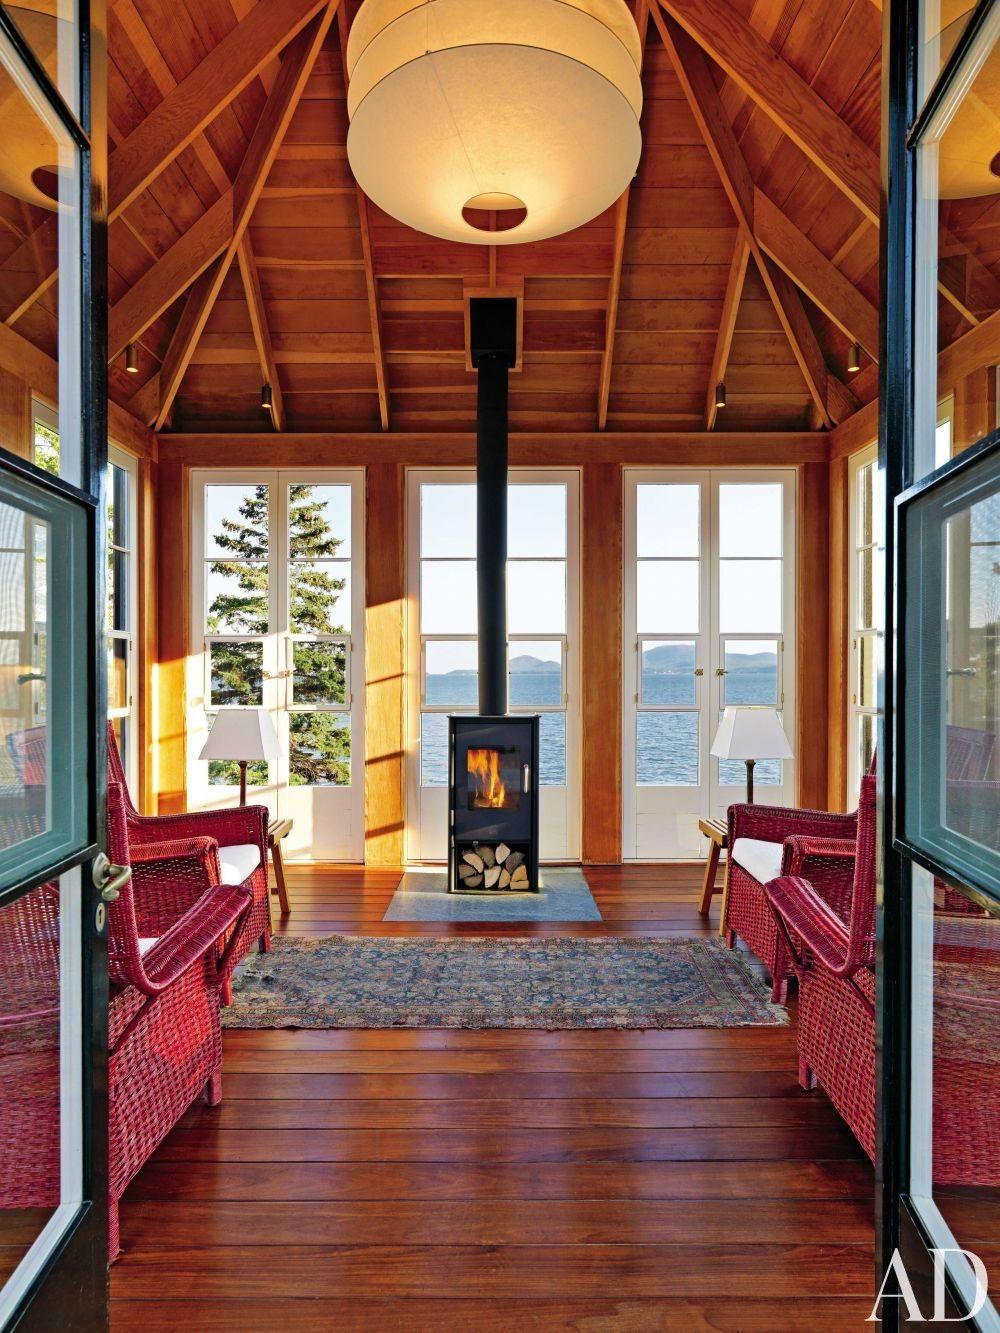 Rustic Living Room by Len Morgan via @archdigest # ...